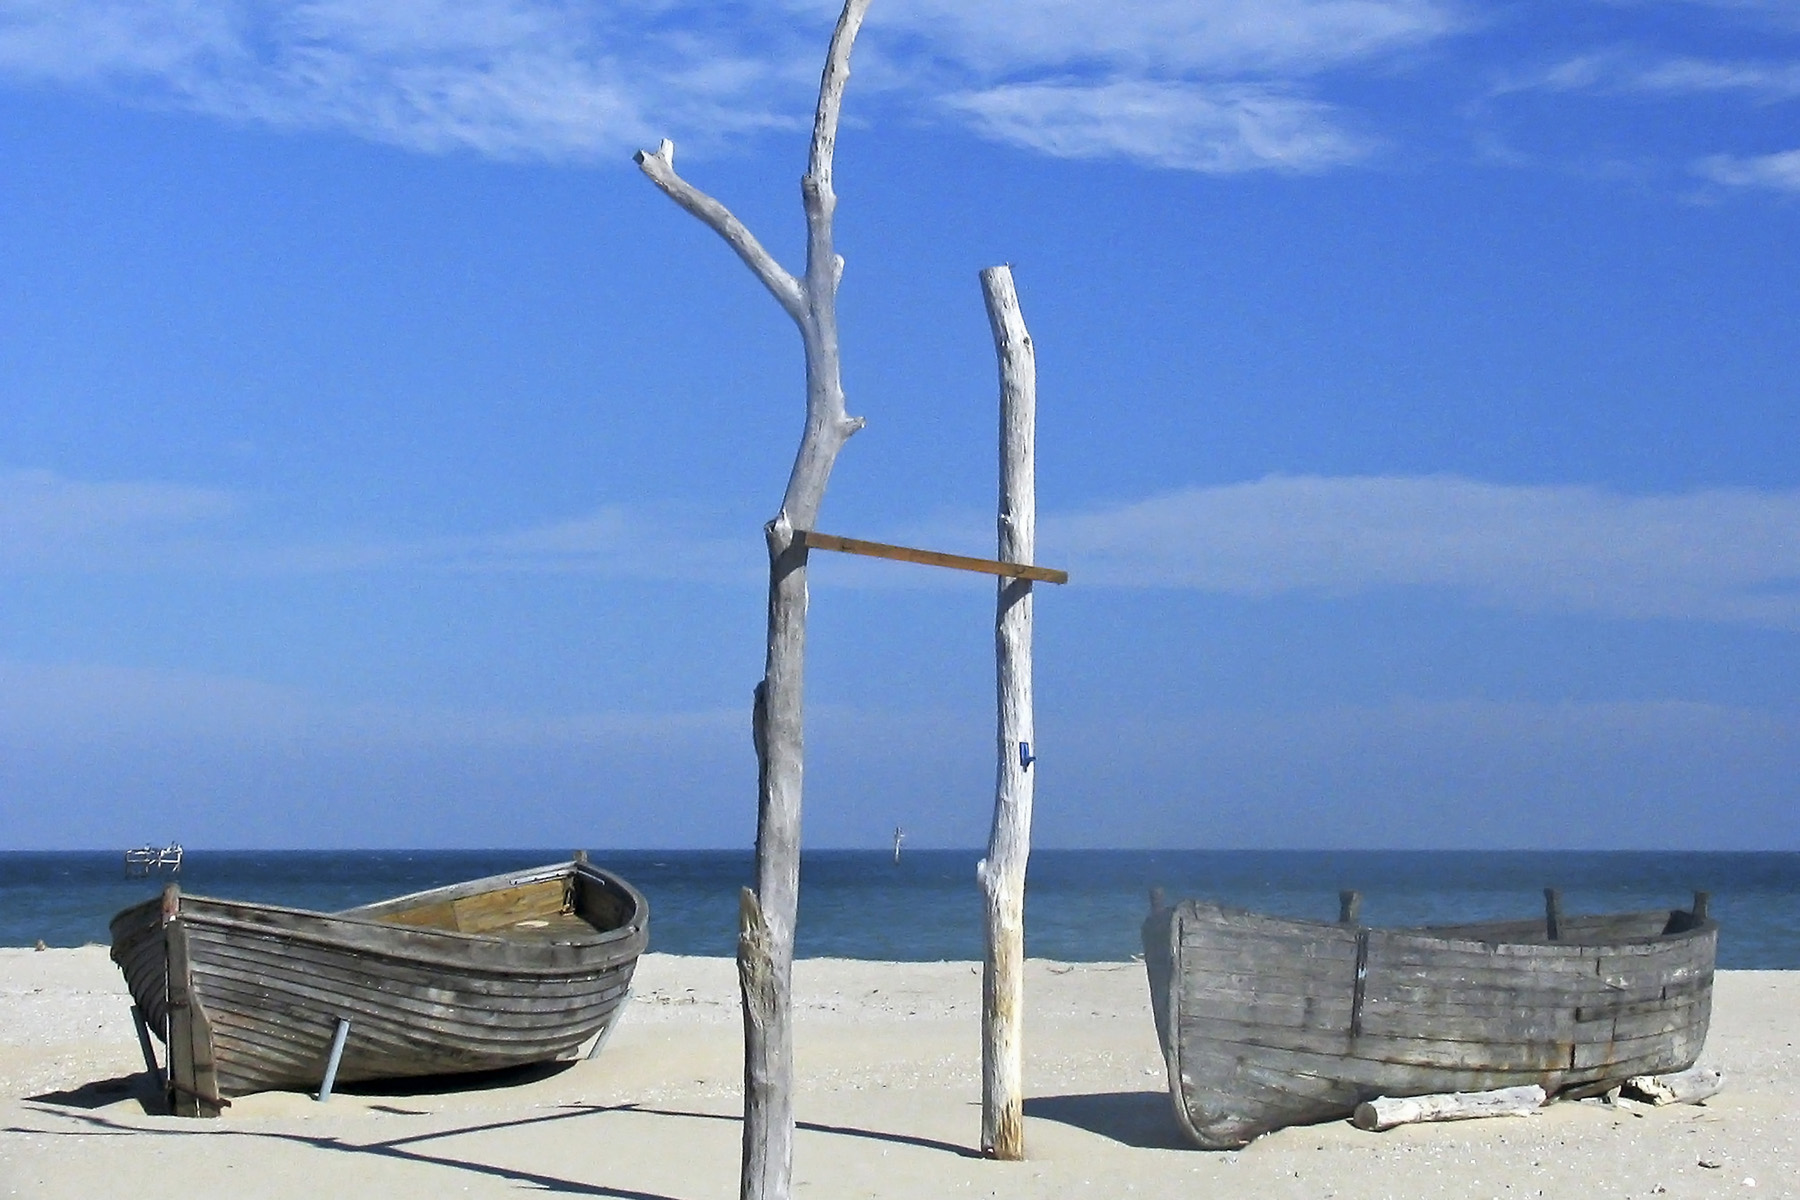 Lonely Sea, Beach, Blacksea, Boats, Bspo06, HQ Photo